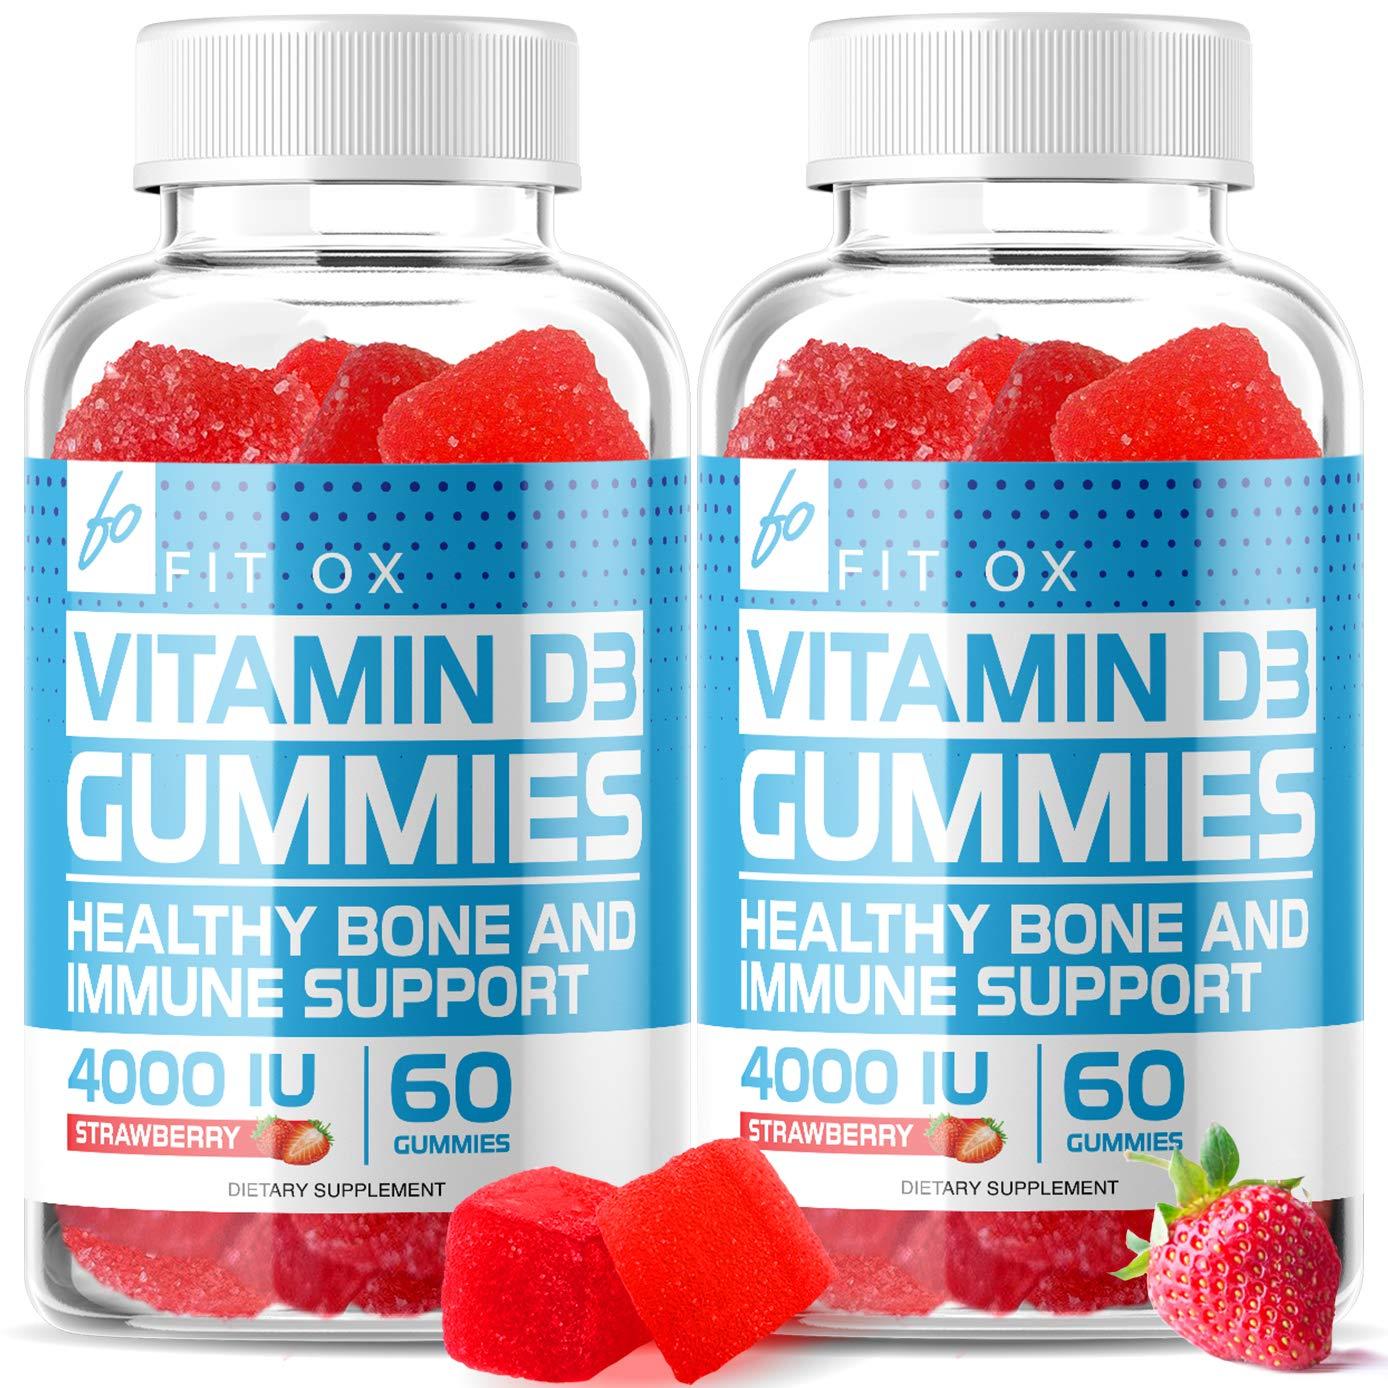 Vitamin D Gummies, Chewable Vitamin D3 w/Zinc, Echinacea Supplements 4000 IU for Adults Kids - Immune Booster, Bone Health, Joint Muscle Support -Tablet Powder Alternative-Vegan (2 Pack)